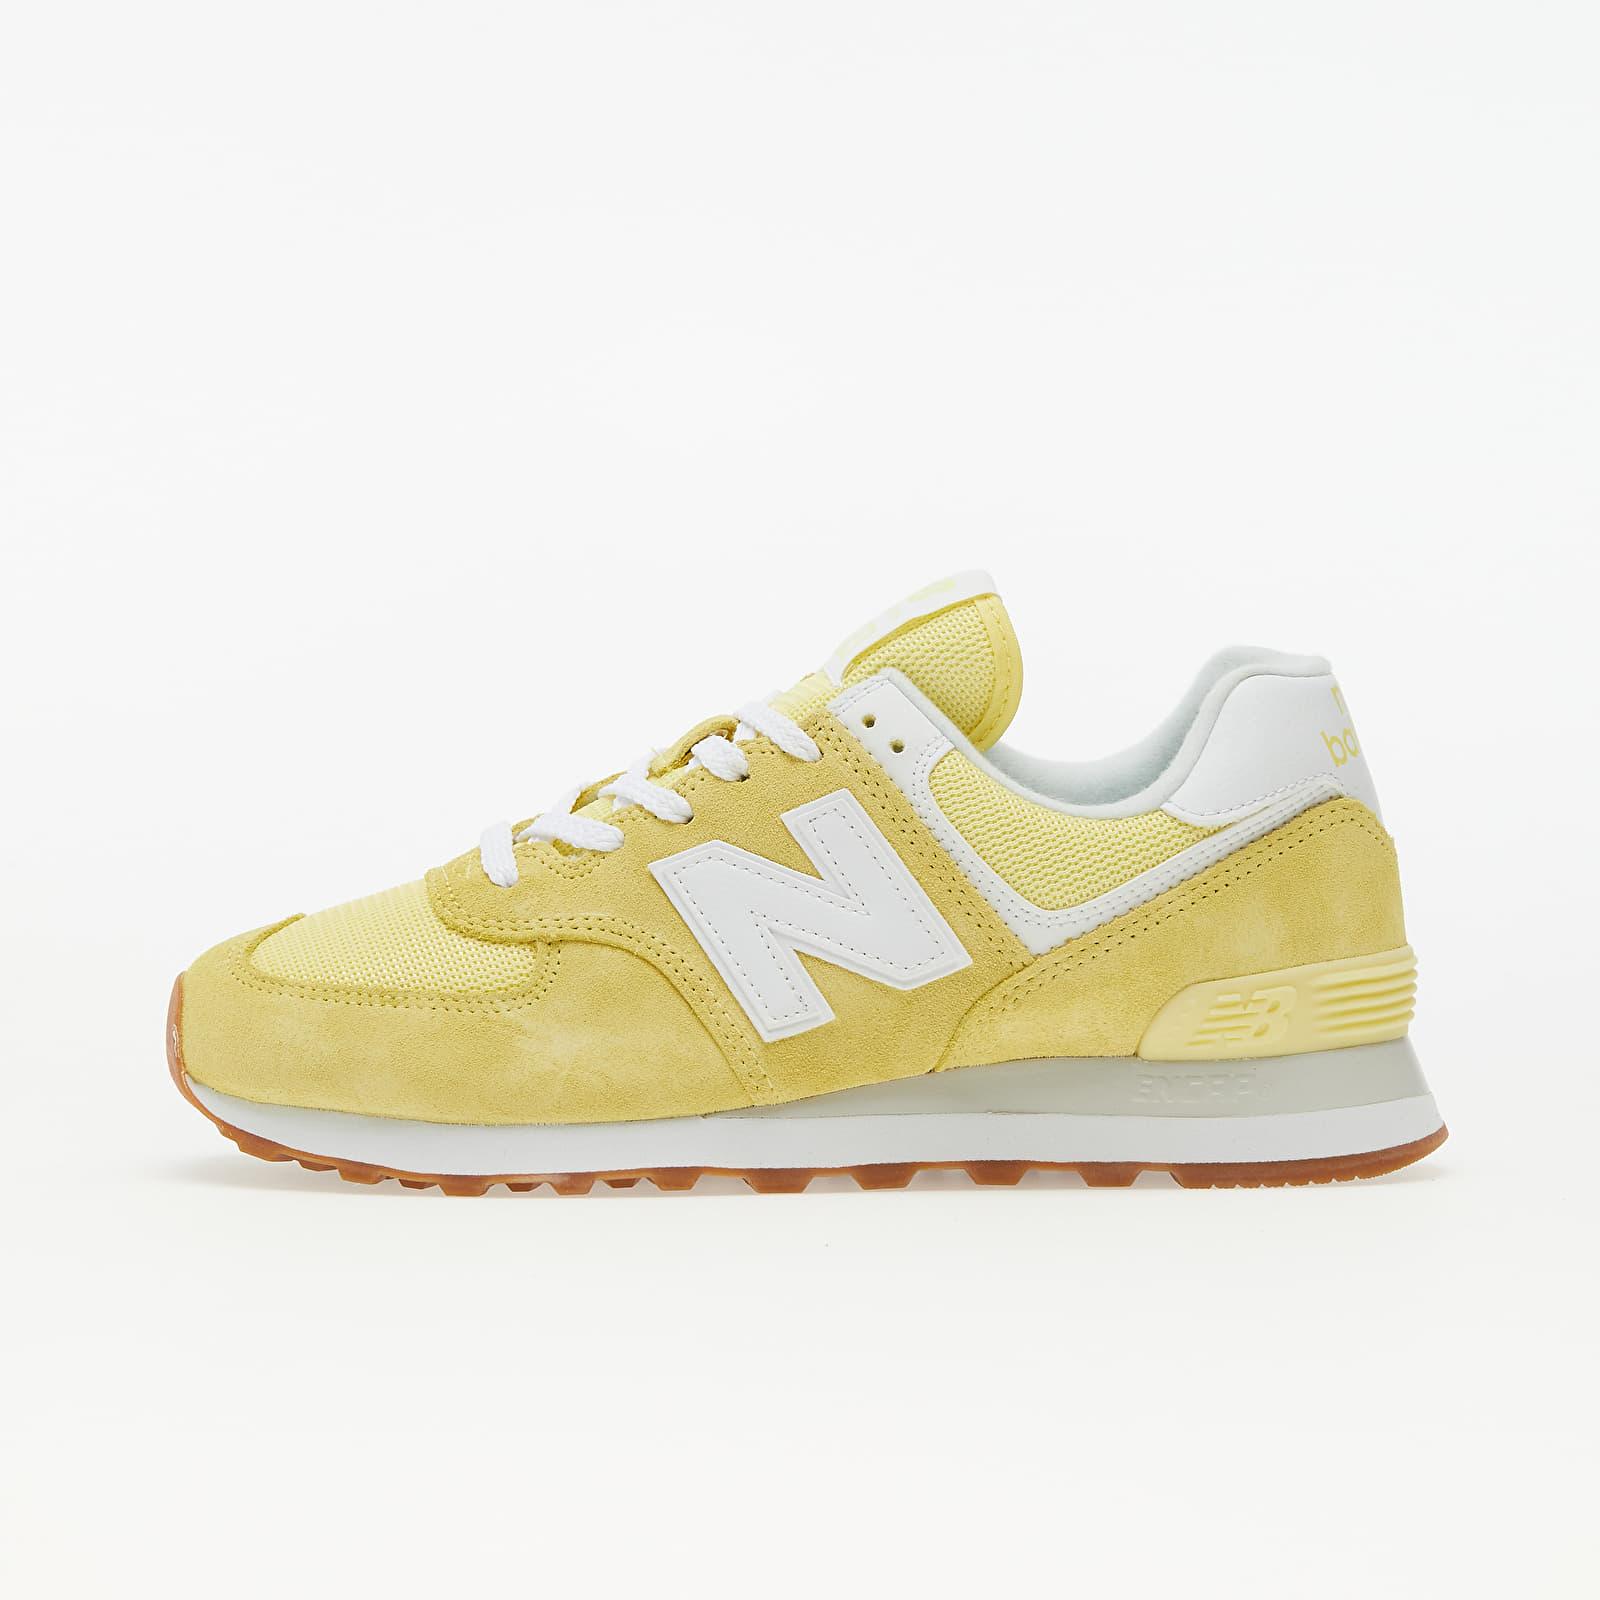 New Balance 574 Yellow EUR 37